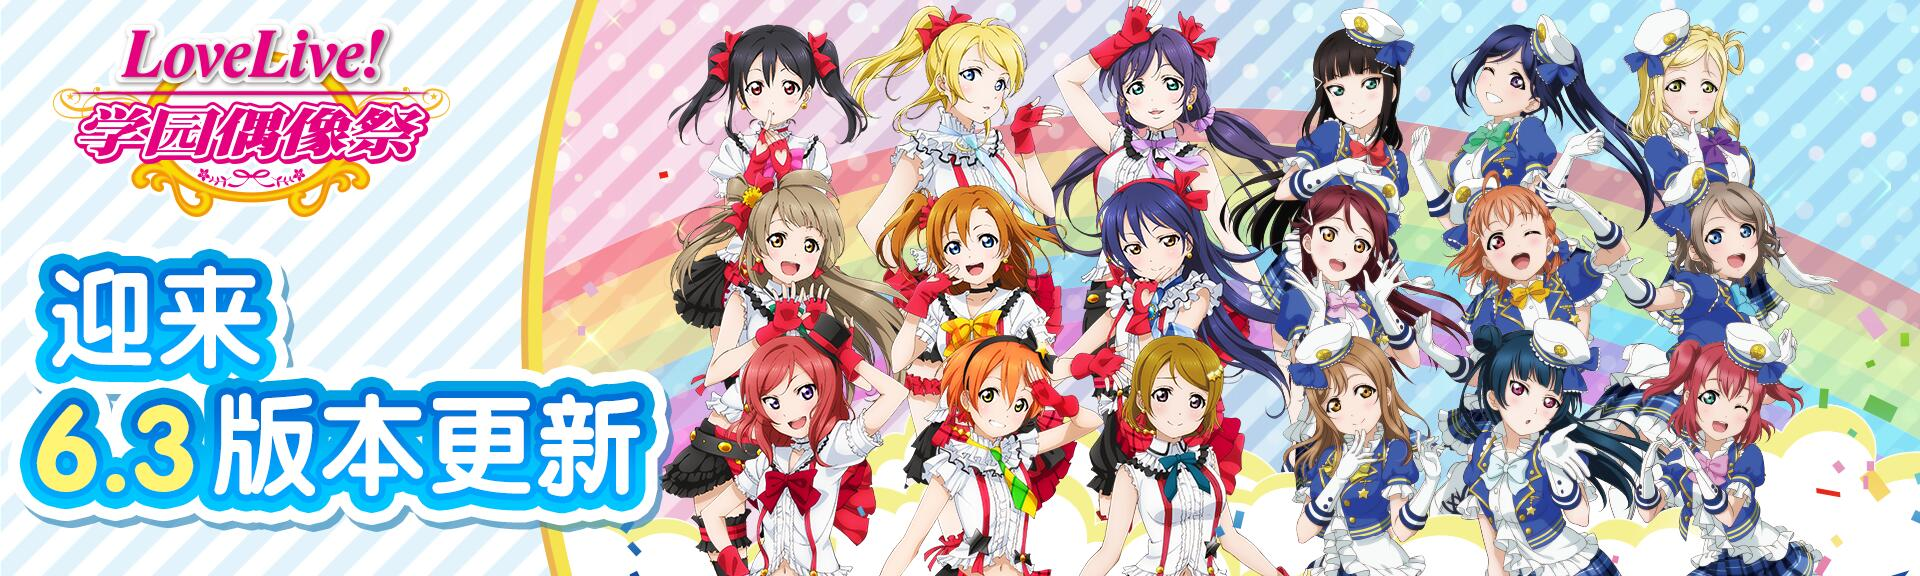 《Love Live! 学园偶像祭》迎来6.3版本更新 七大活动登场